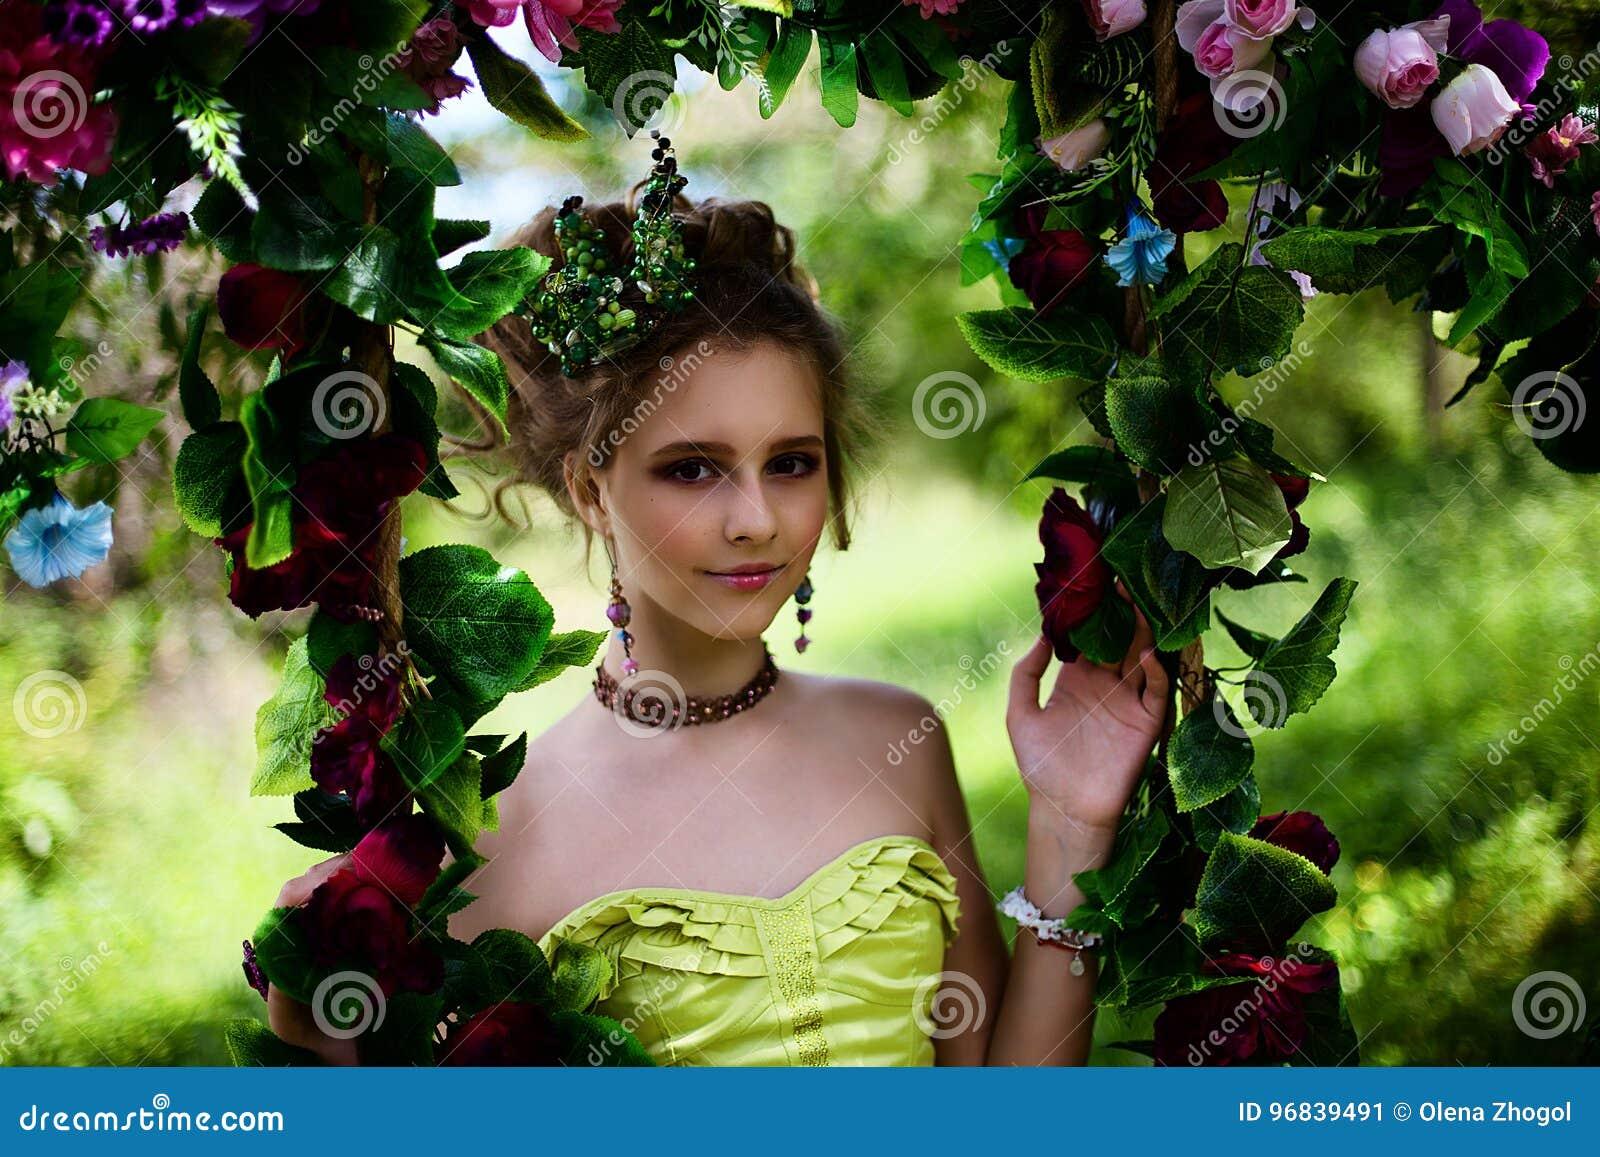 Beautiful girl in the garden with flowers in princess dress stock download beautiful girl in the garden with flowers in princess dress stock image image of izmirmasajfo